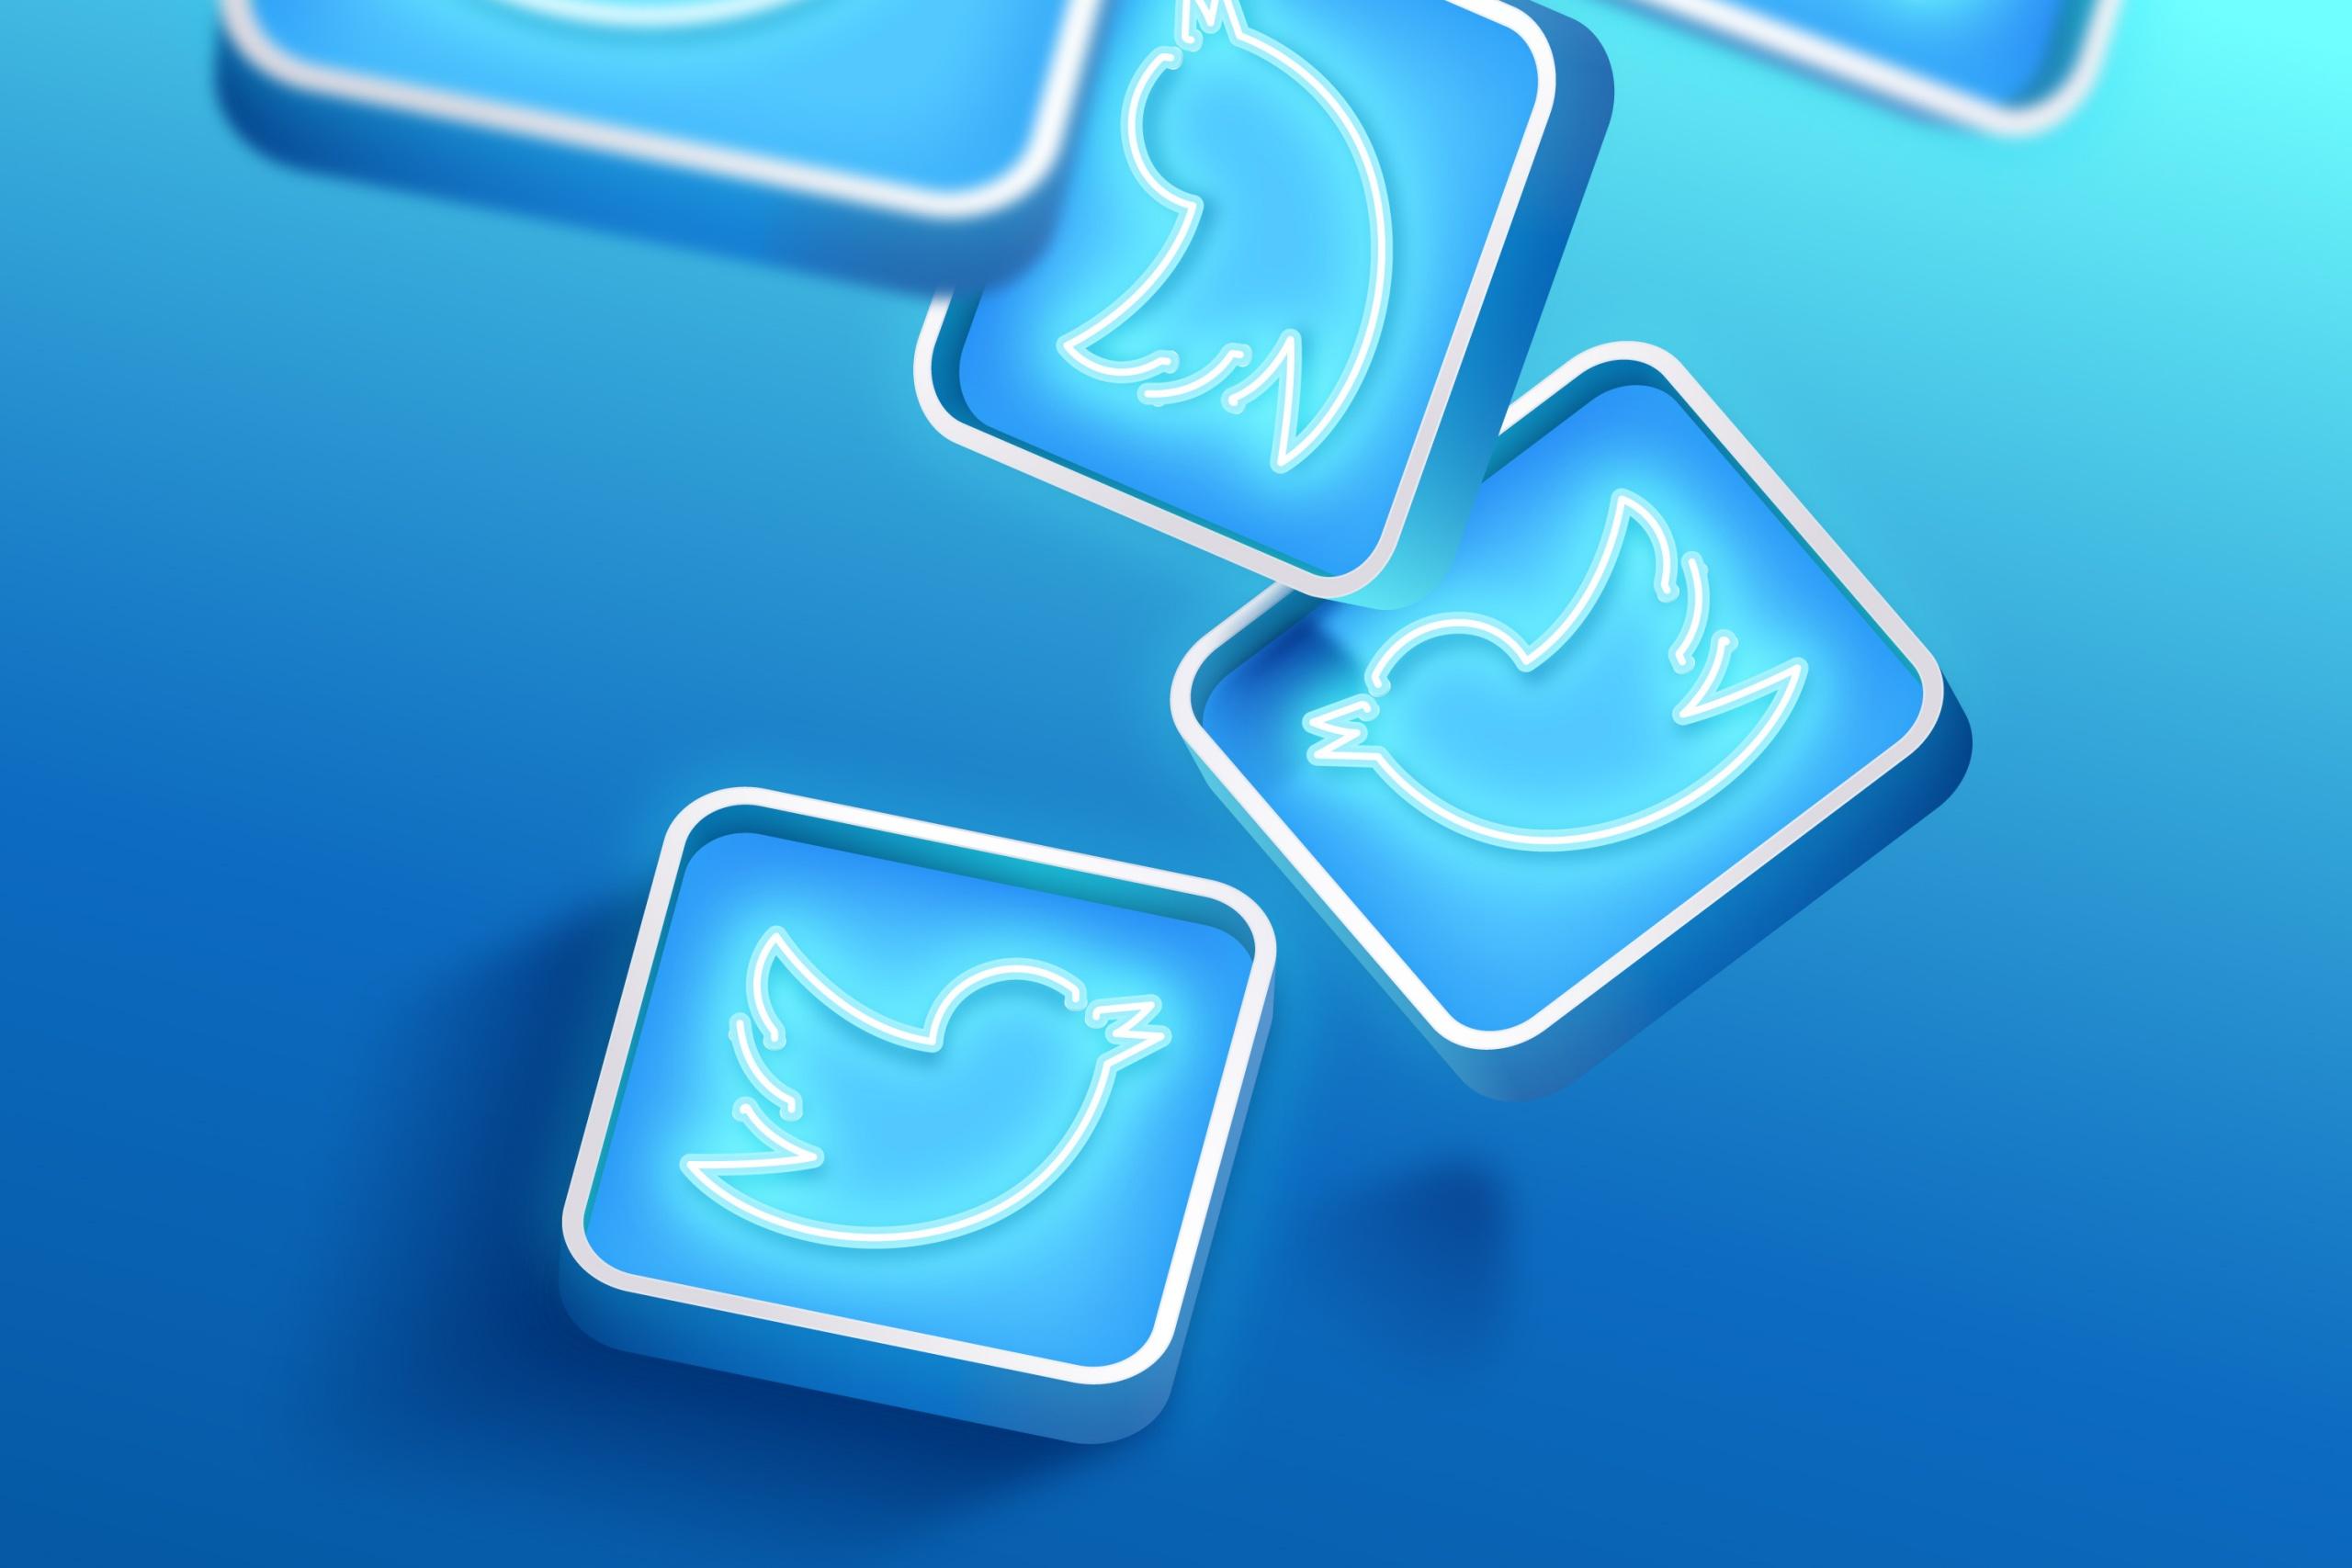 Co to jest Twitter?